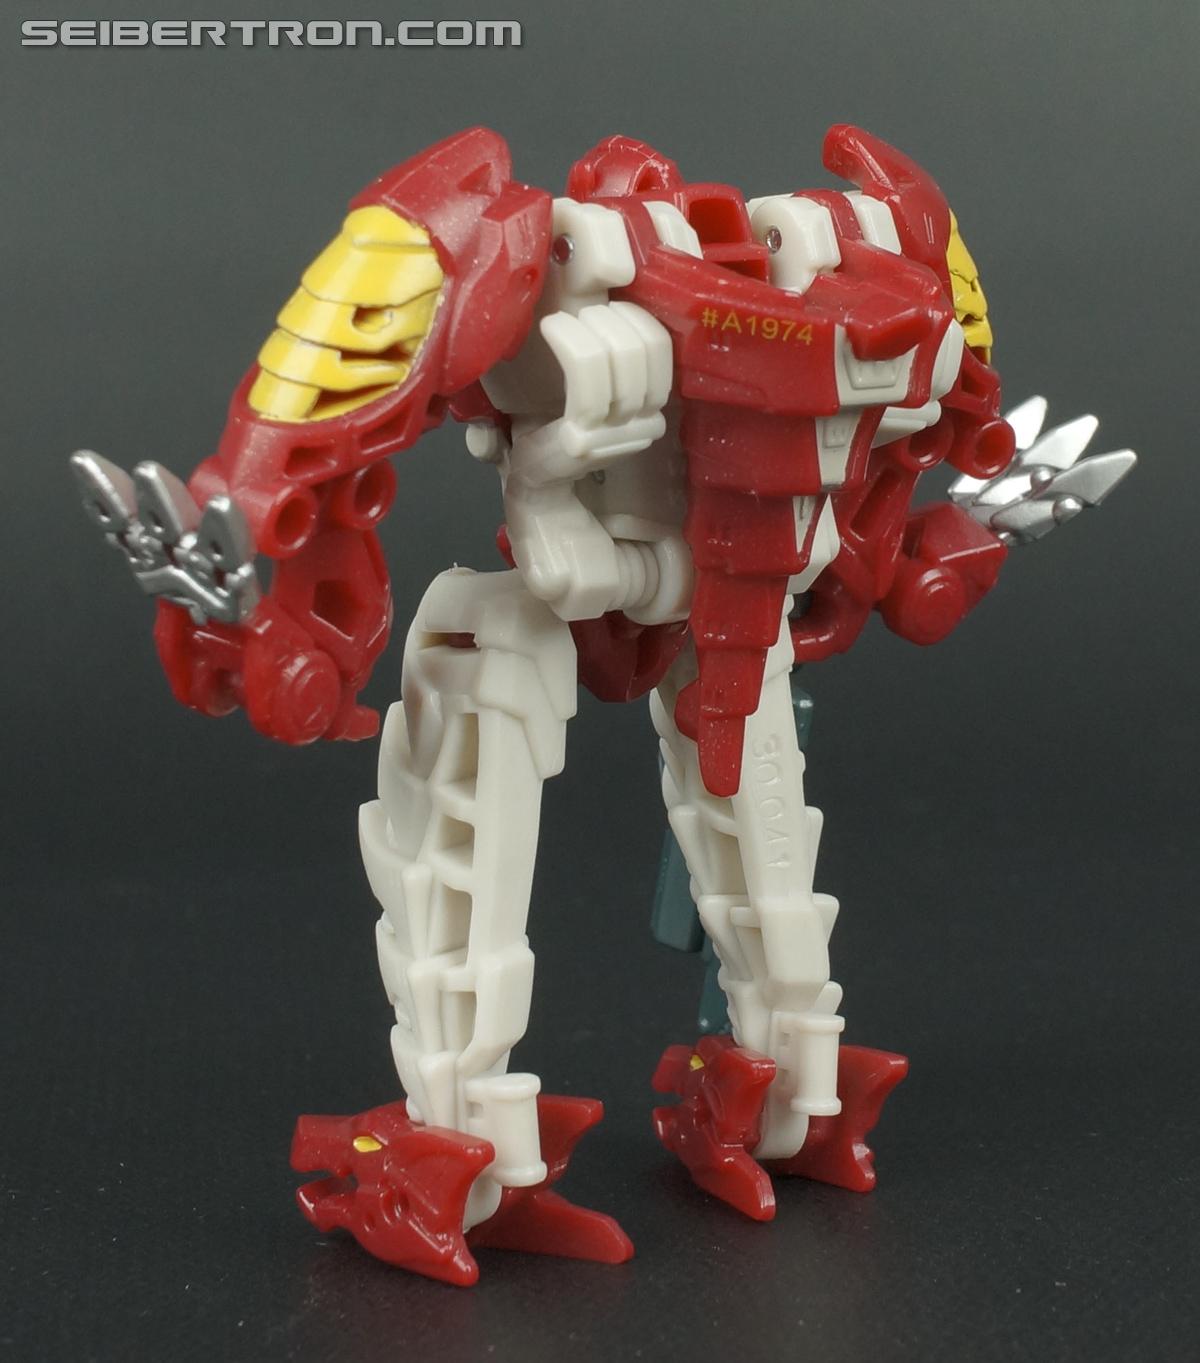 Transformers Prime Beast Hunters Cyberverse Hun-Gurrr (Image #60 of 115)